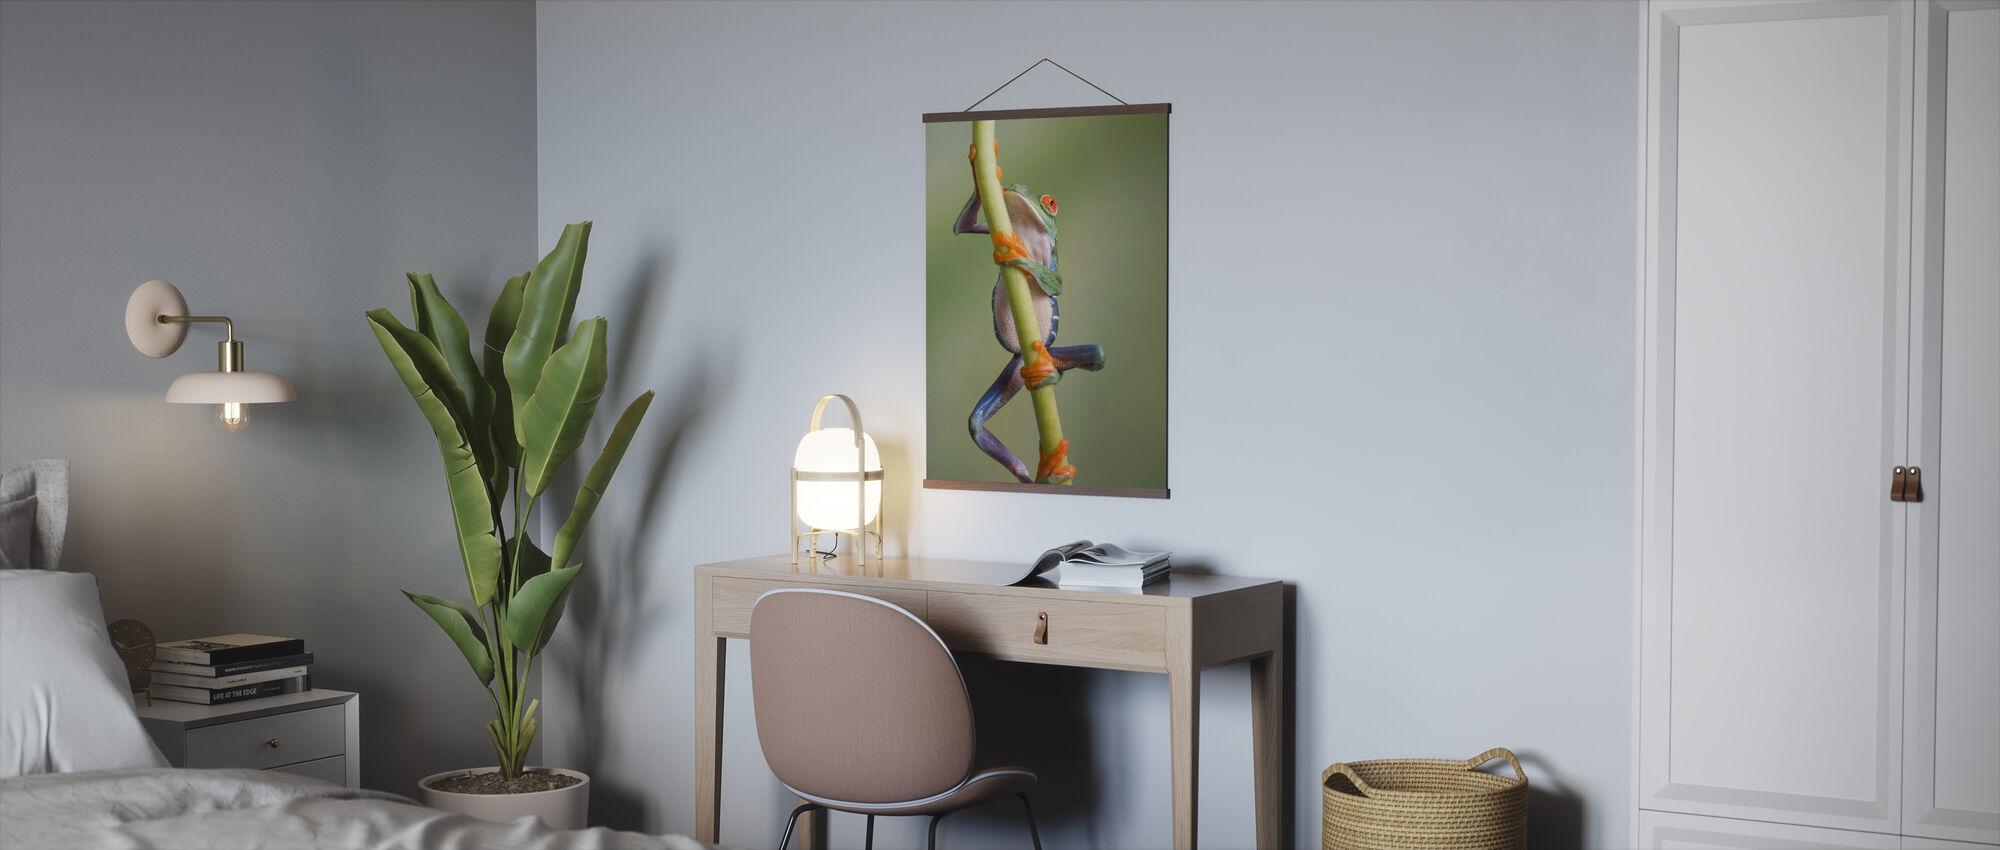 Ascending - Poster - Office